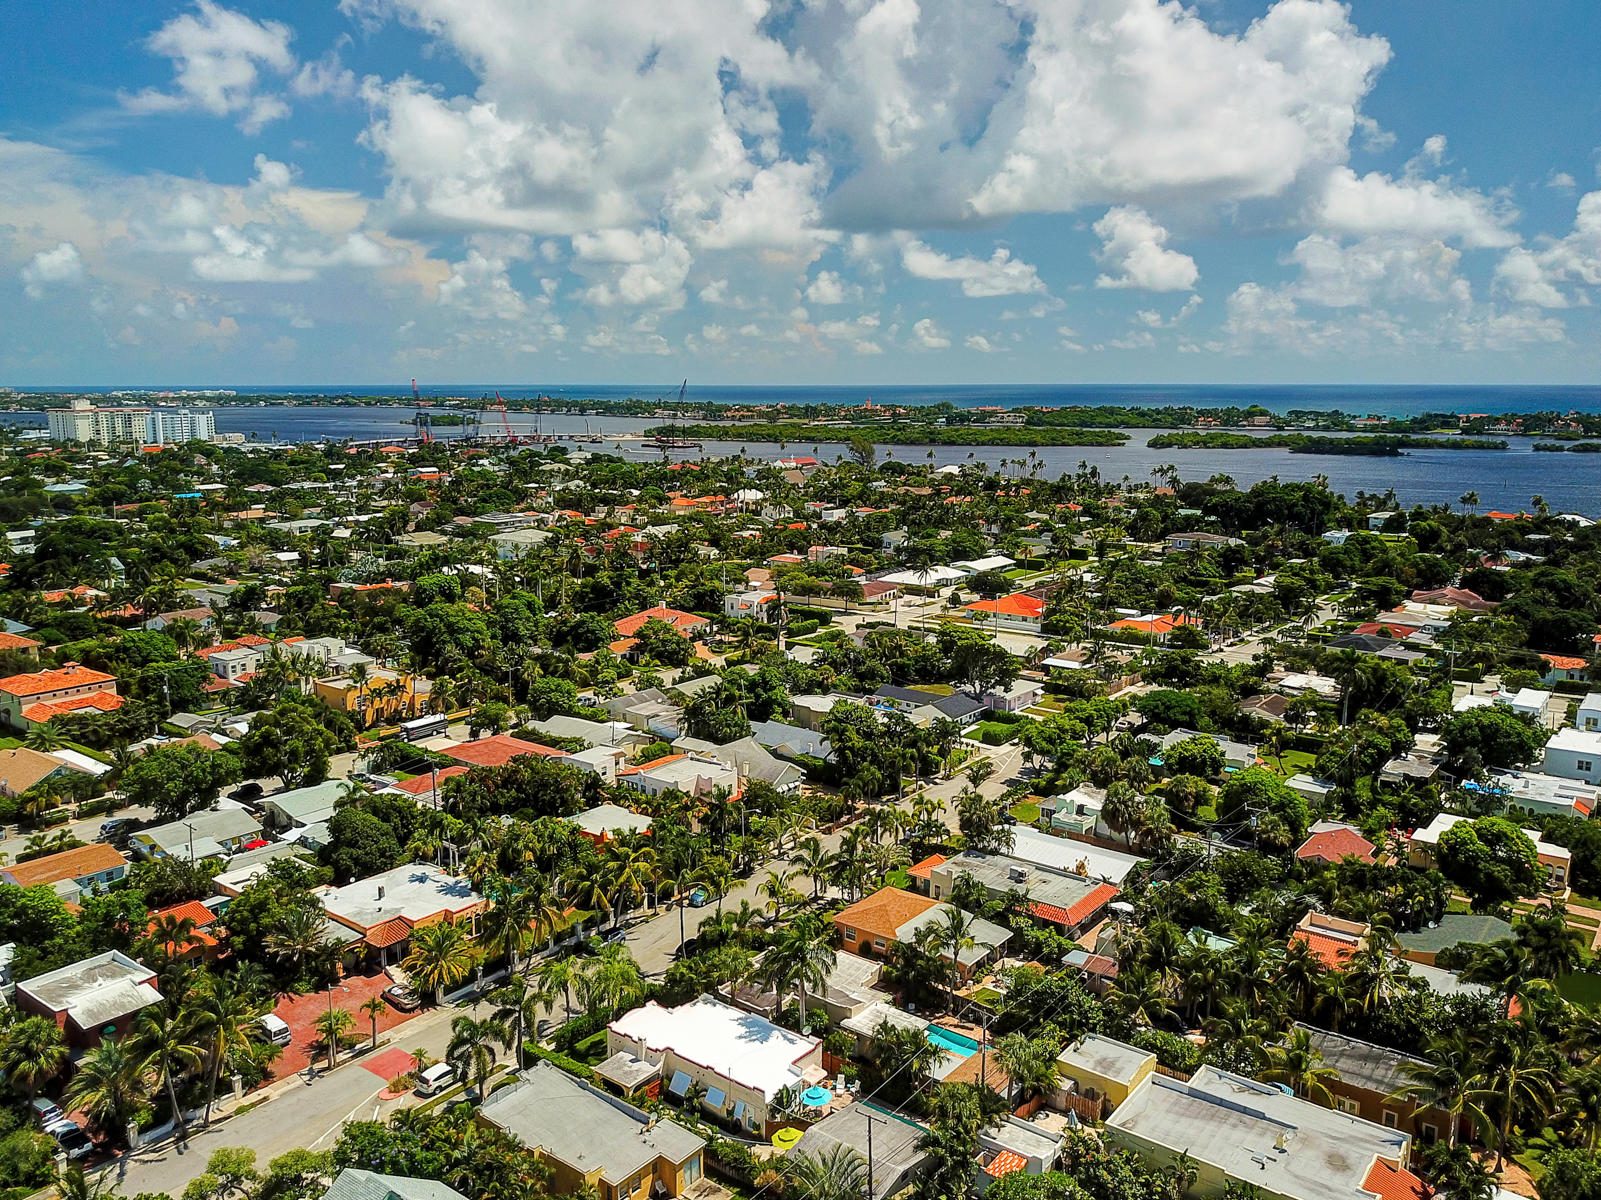 BELAIR WEST PALM BEACH FLORIDA